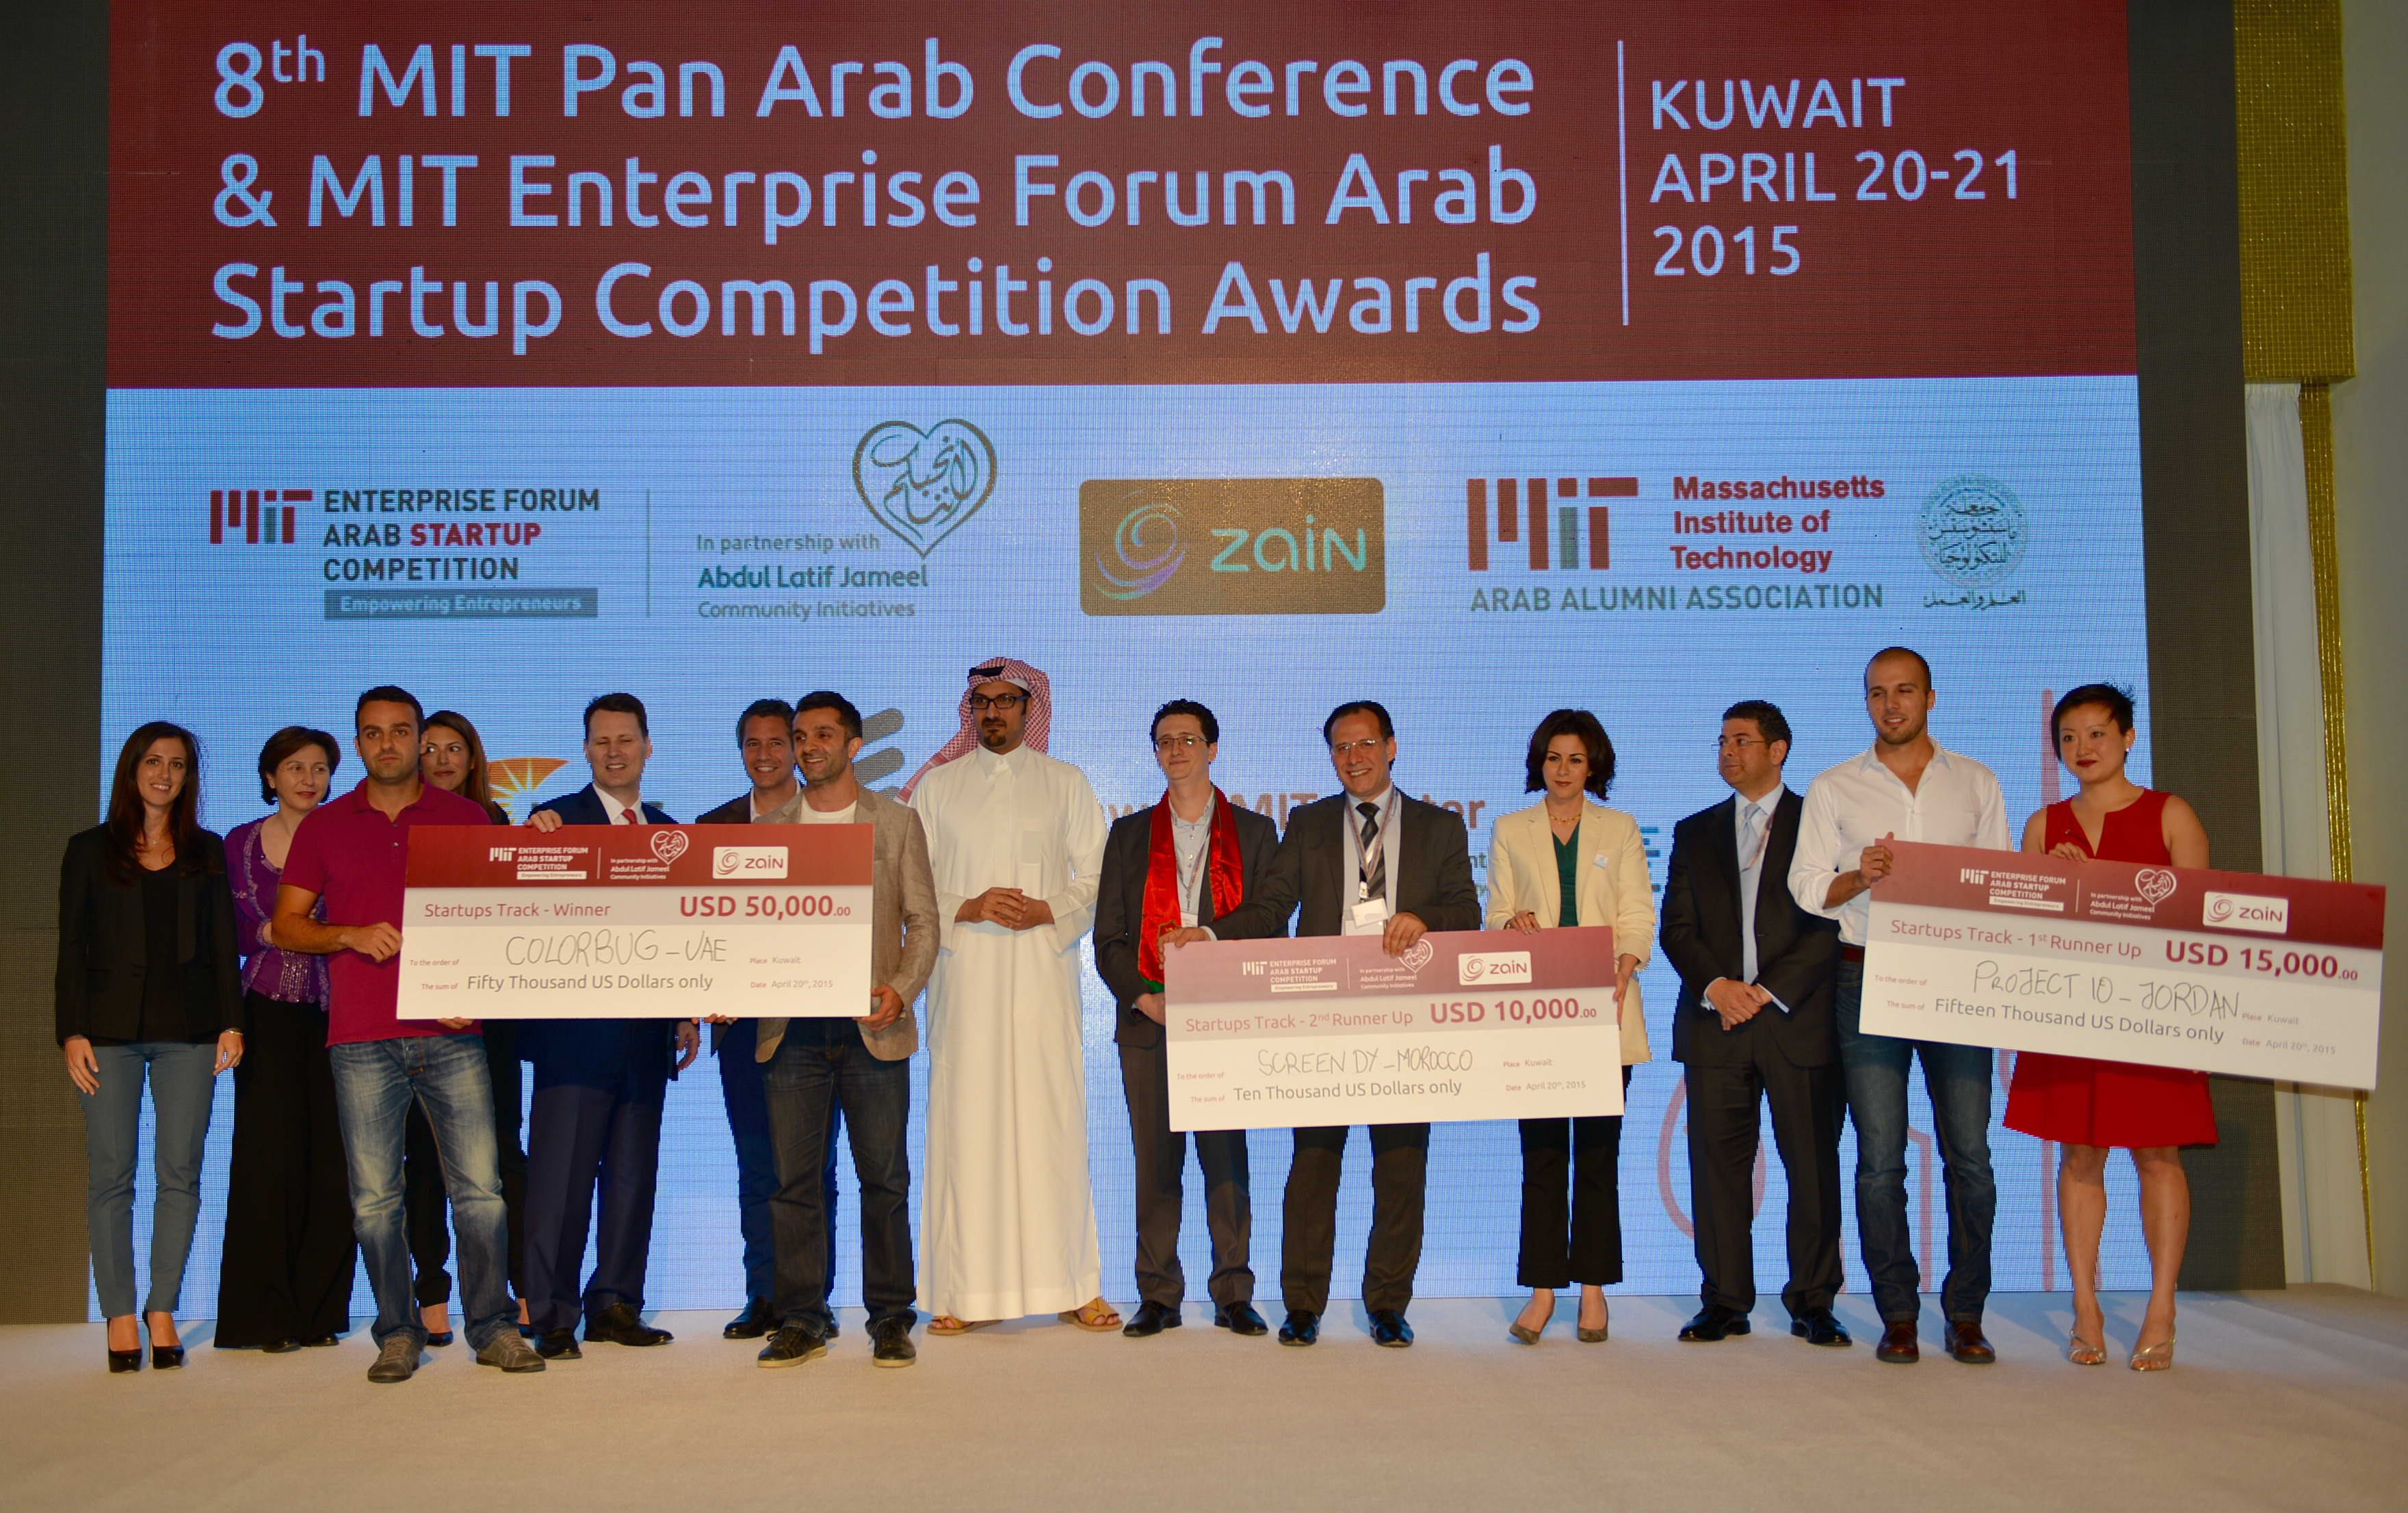 Winners announced at the Zain-sponsored MIT Enterprise Forum